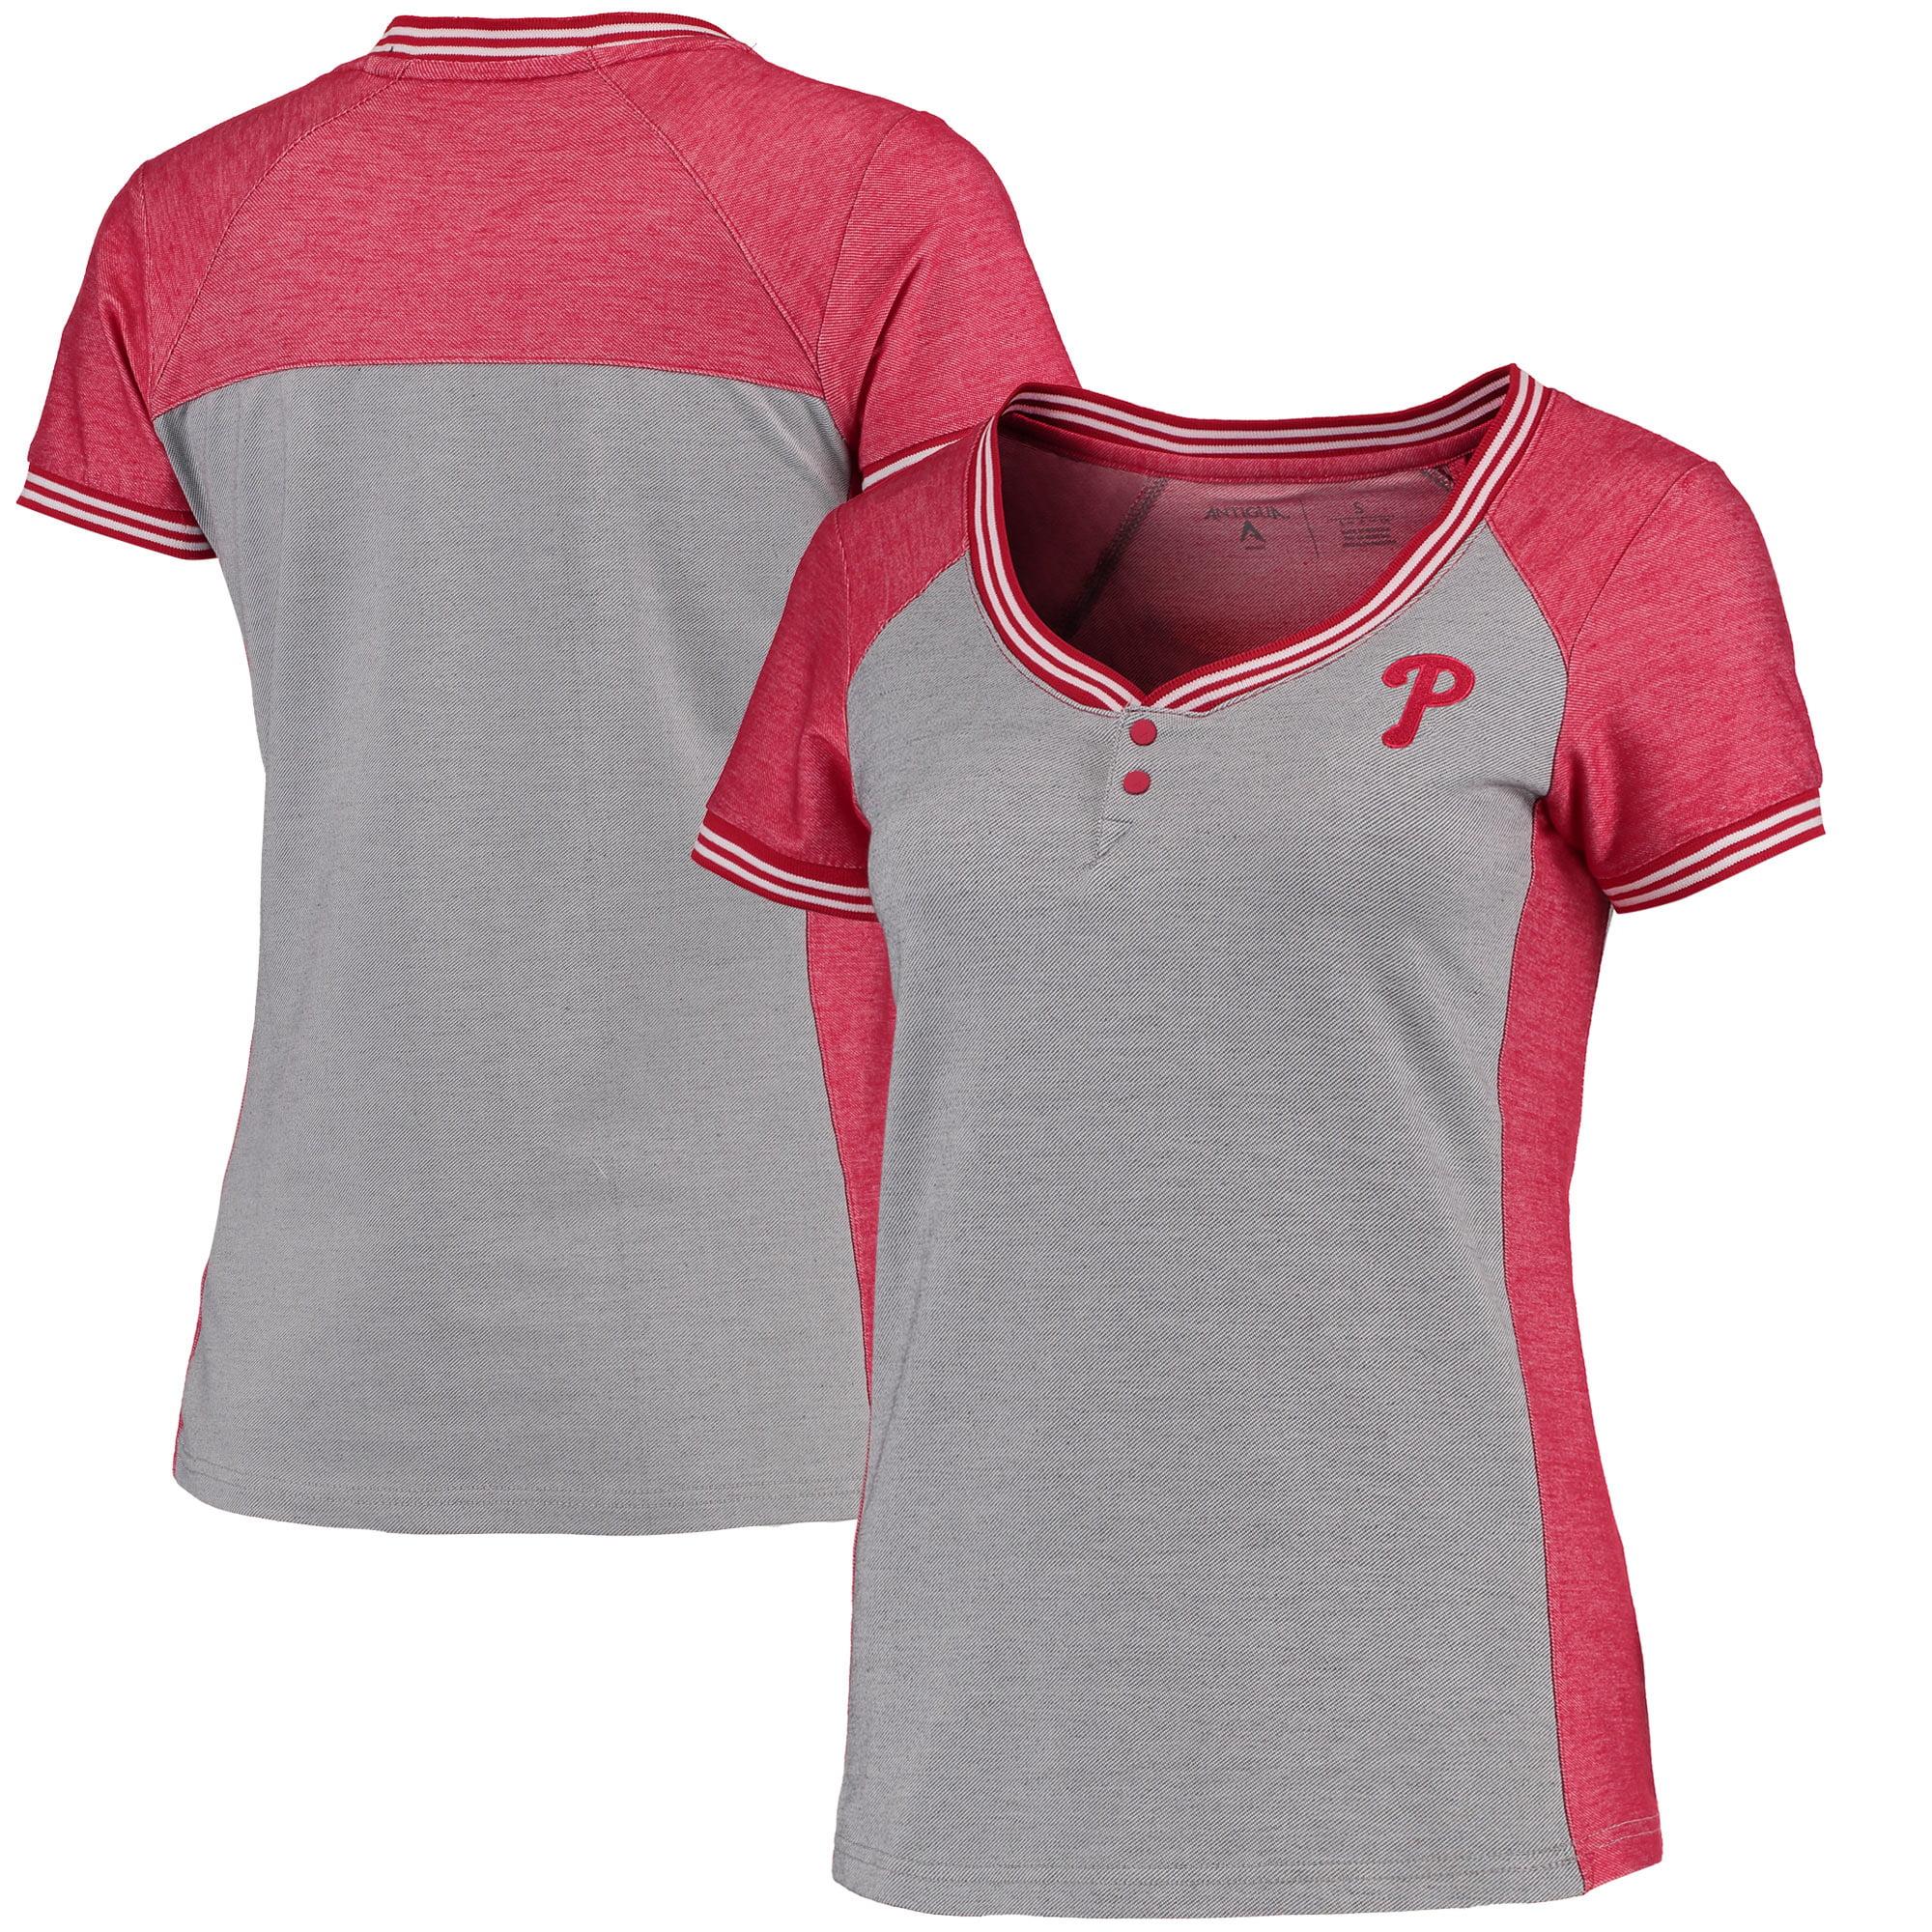 Philadelphia Phillies Antigua Women's Quick Henley T-Shirt - Gray/Red